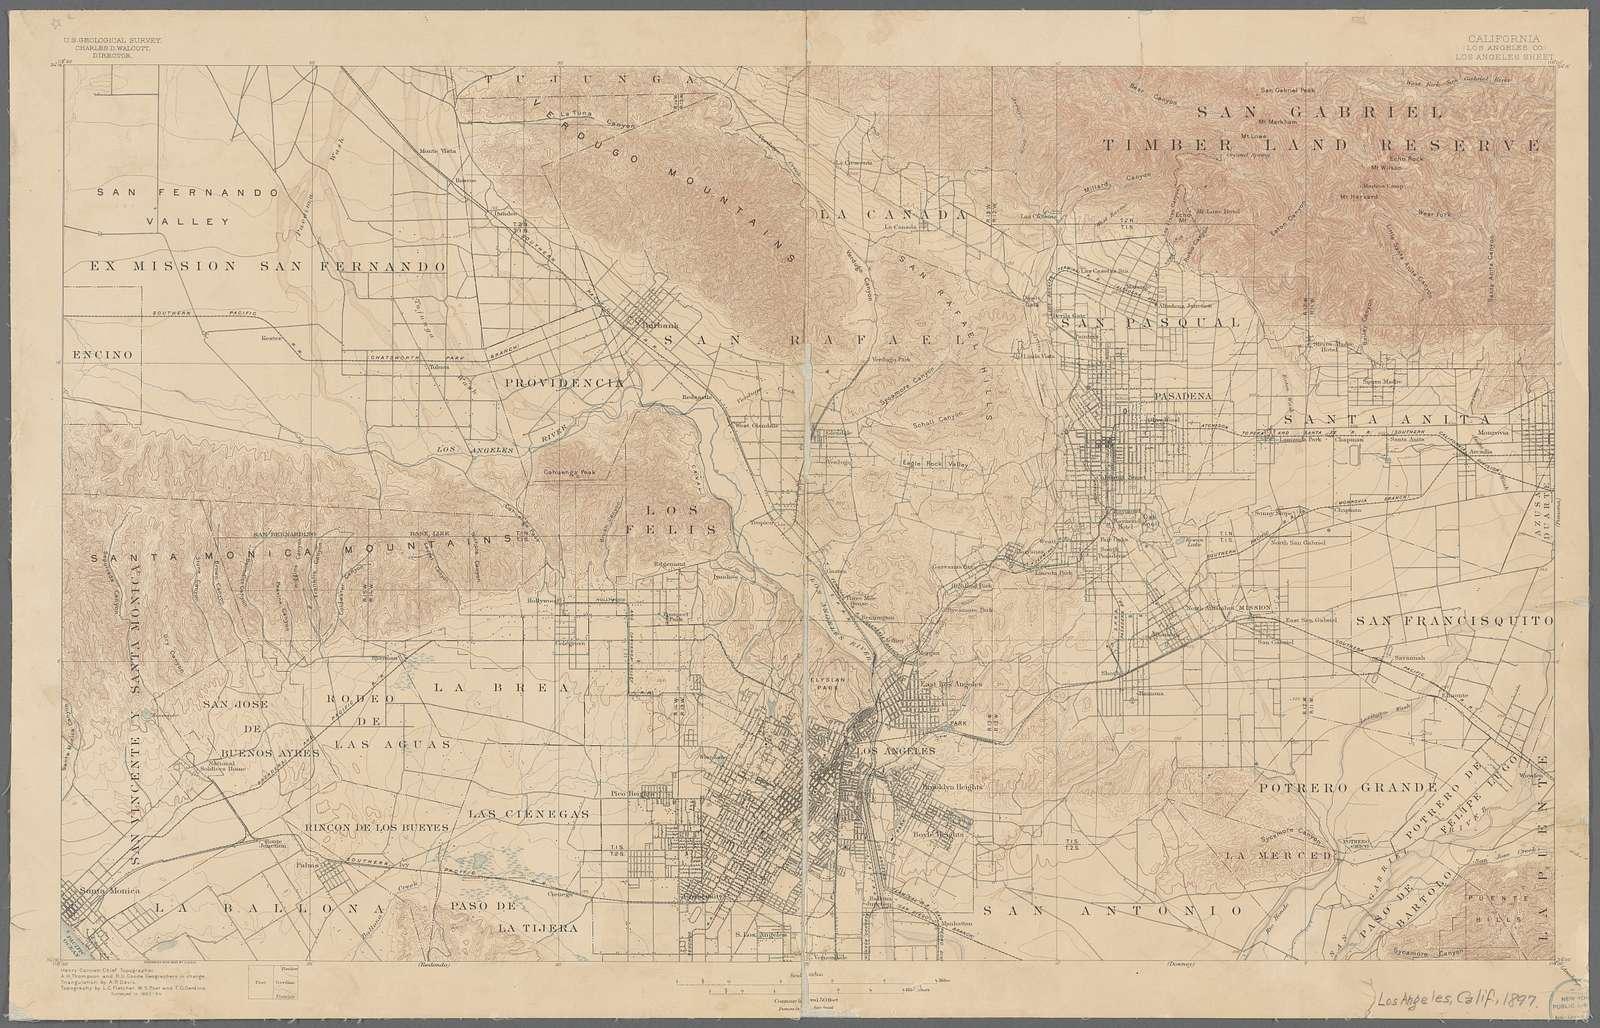 California (Los Angeles Co.) Los Angeles sheet